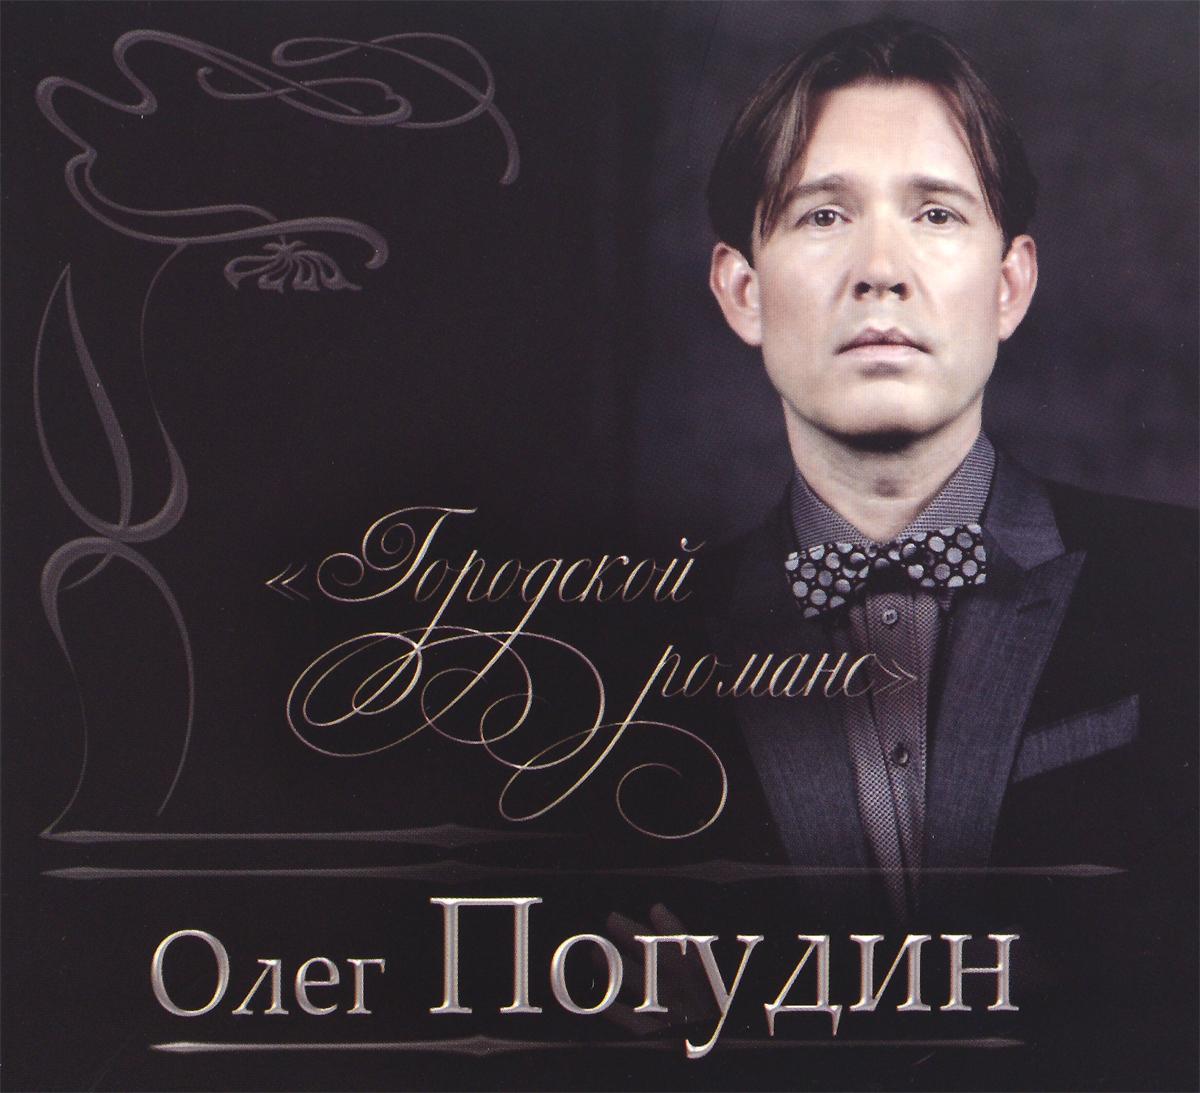 Олег Погудин Олег Погудин. Городской романс (2 CD) олег погудин 2019 08 29t19 00